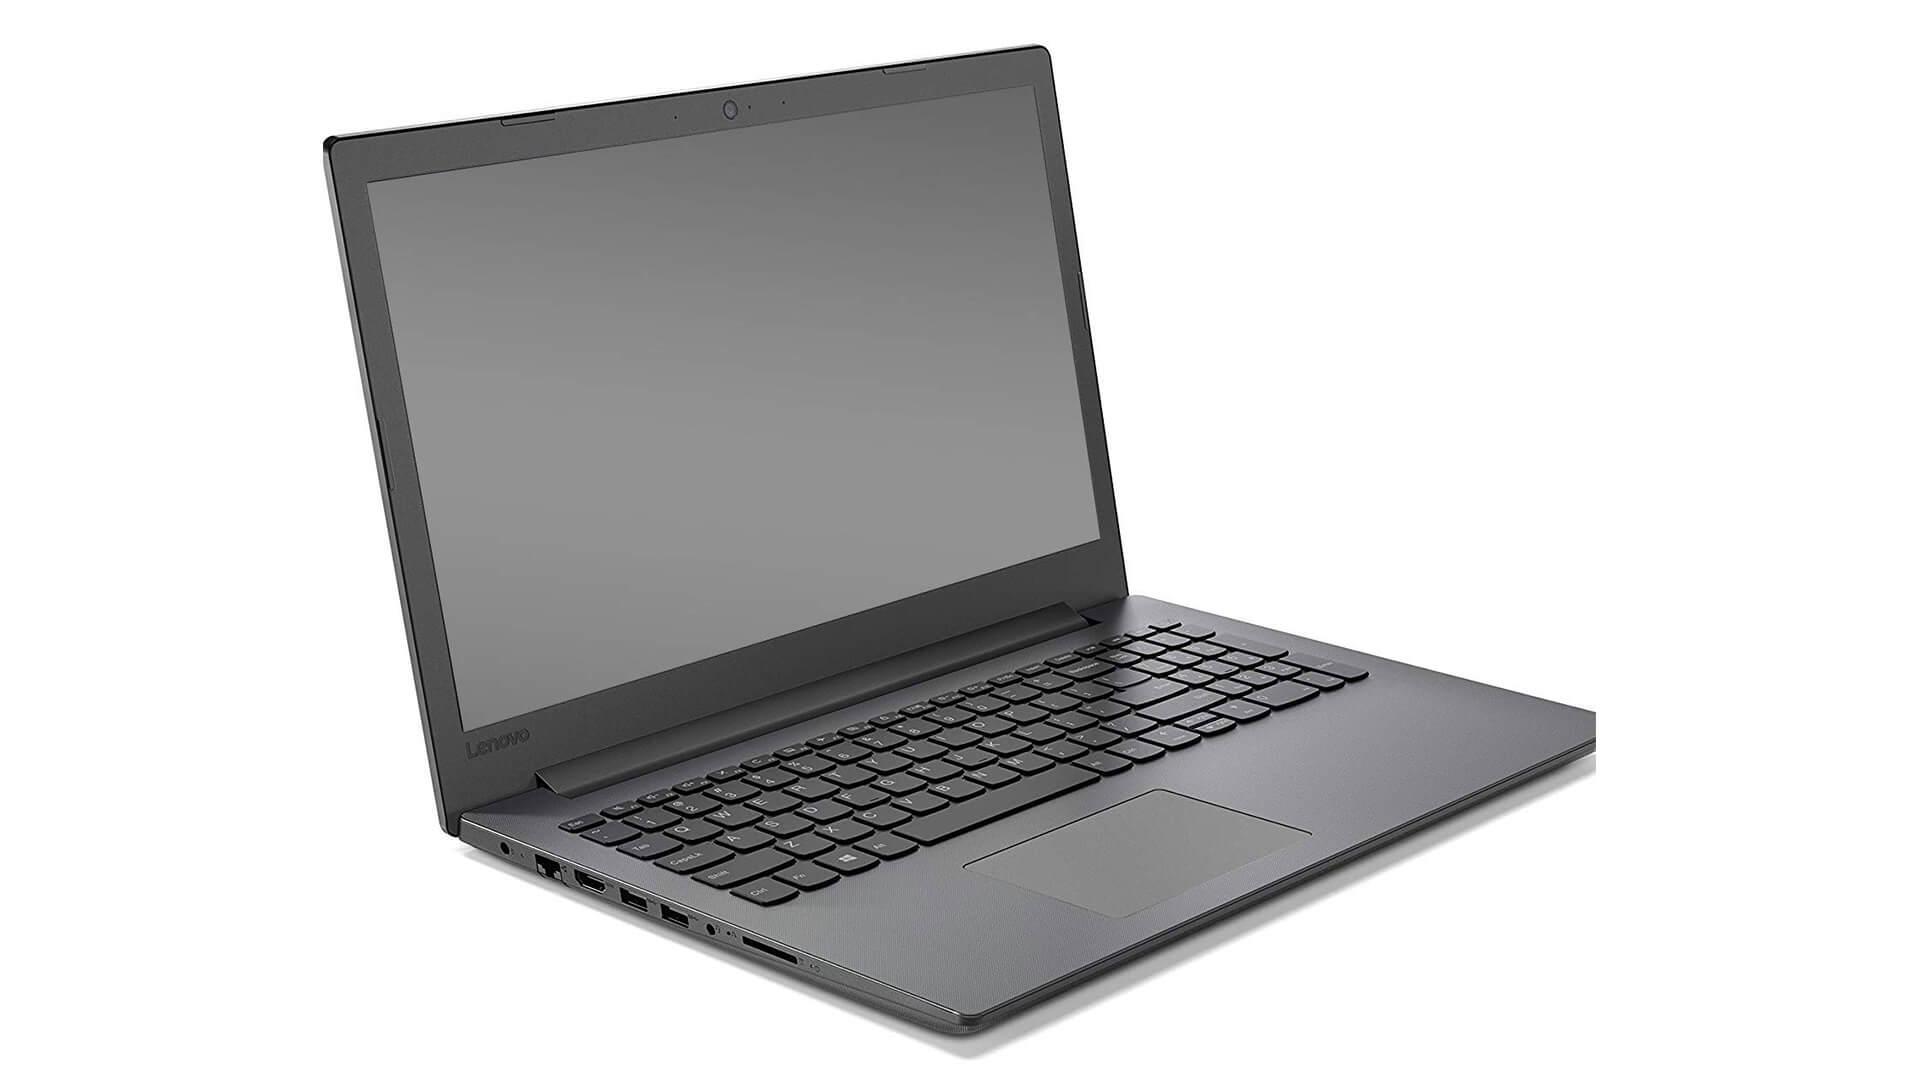 لپ تاپ لنوو Ideapad 130 - I